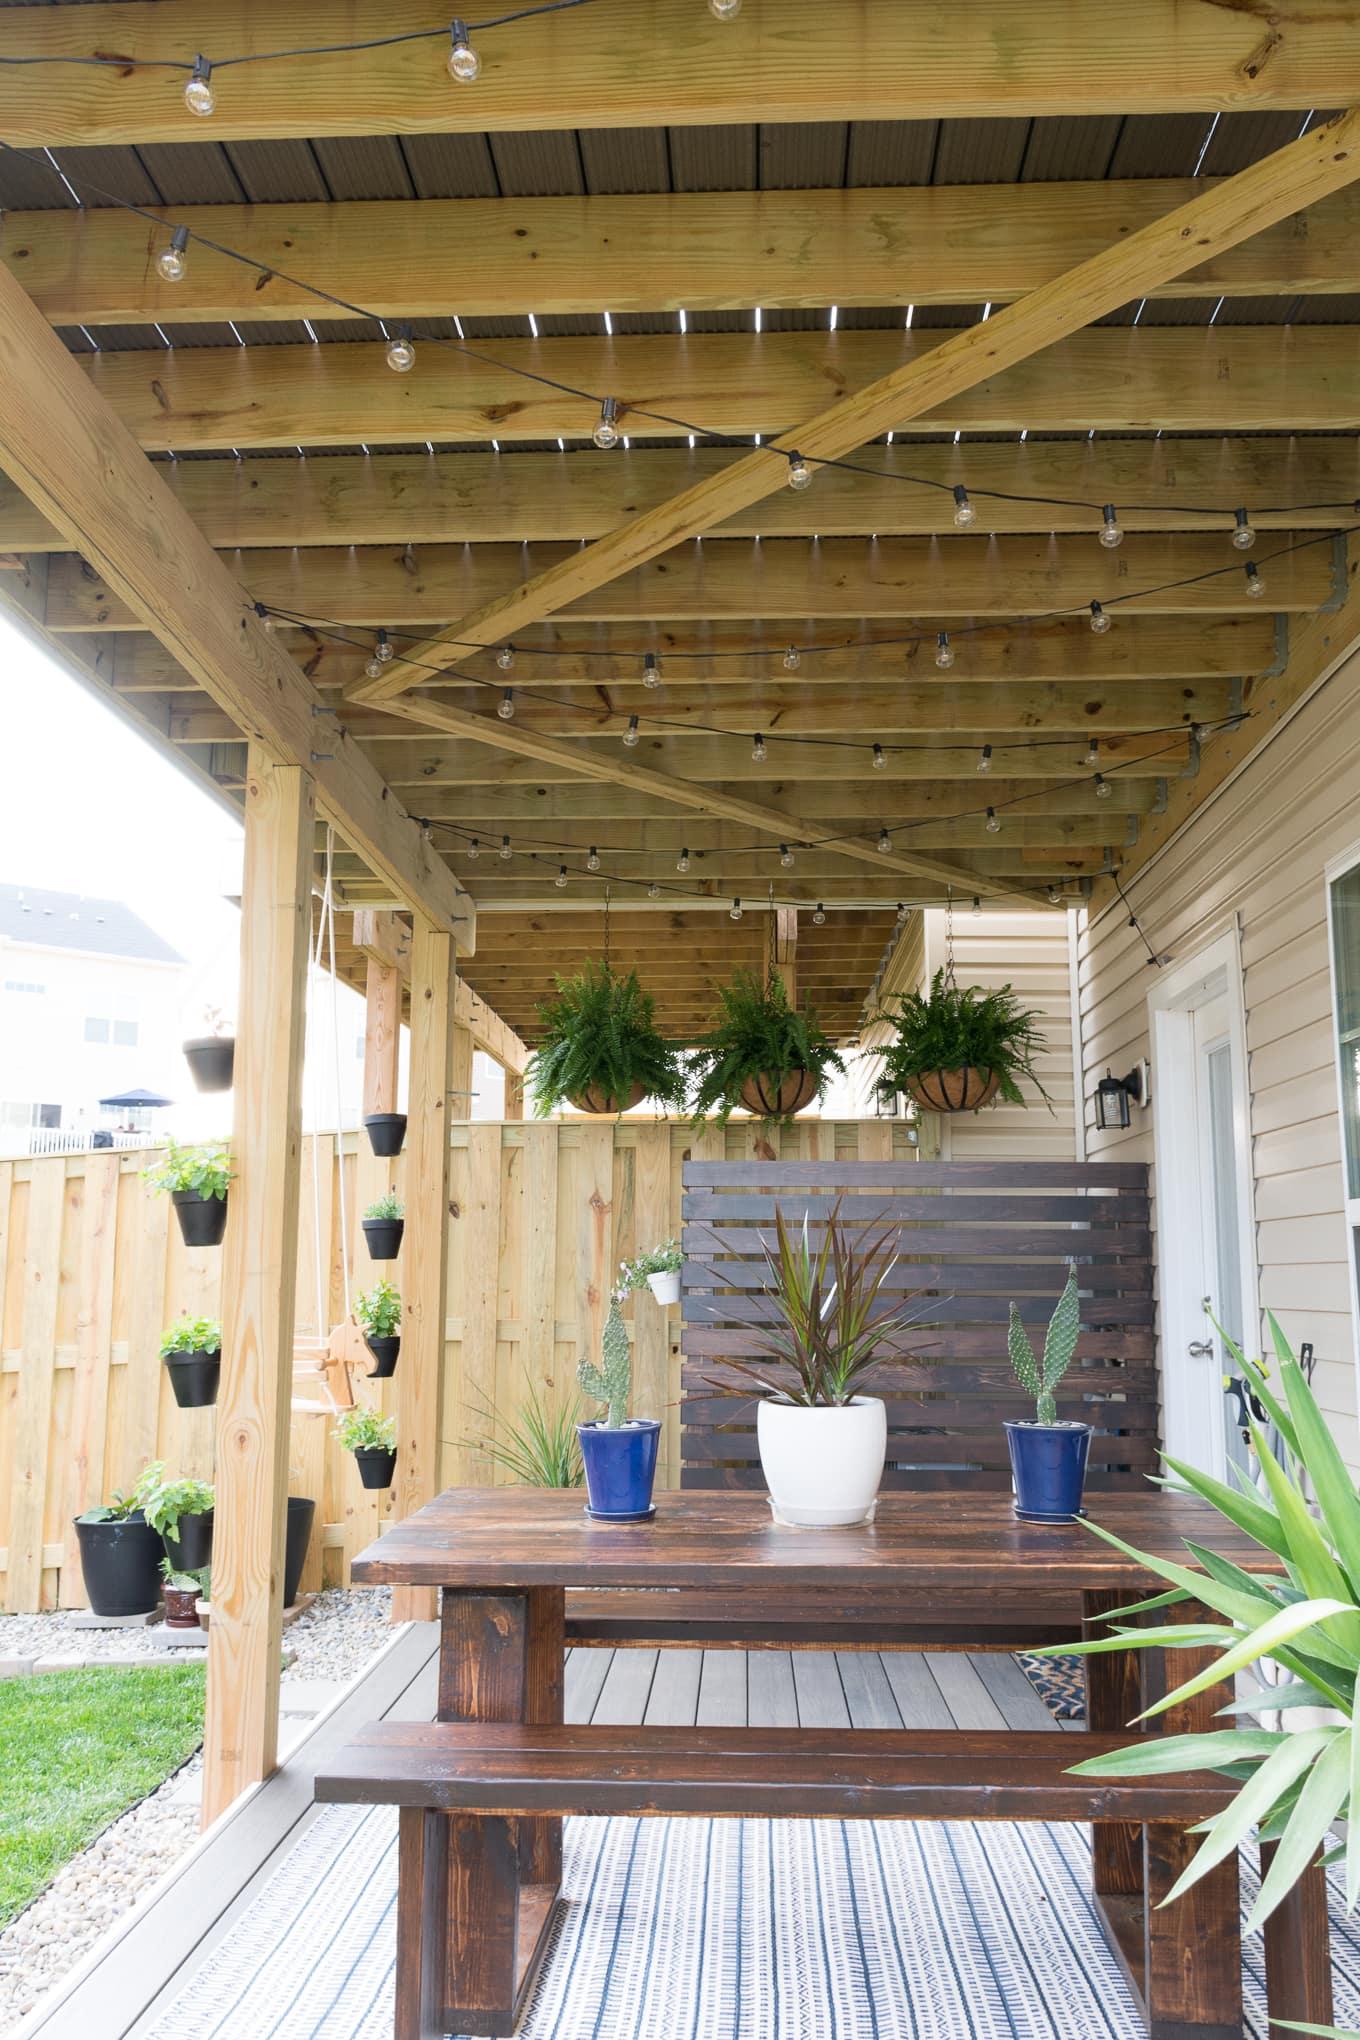 My Tiny Backyard // Modern Design Ideas for a Small Backyard on Modern Small Backyard Ideas id=19940